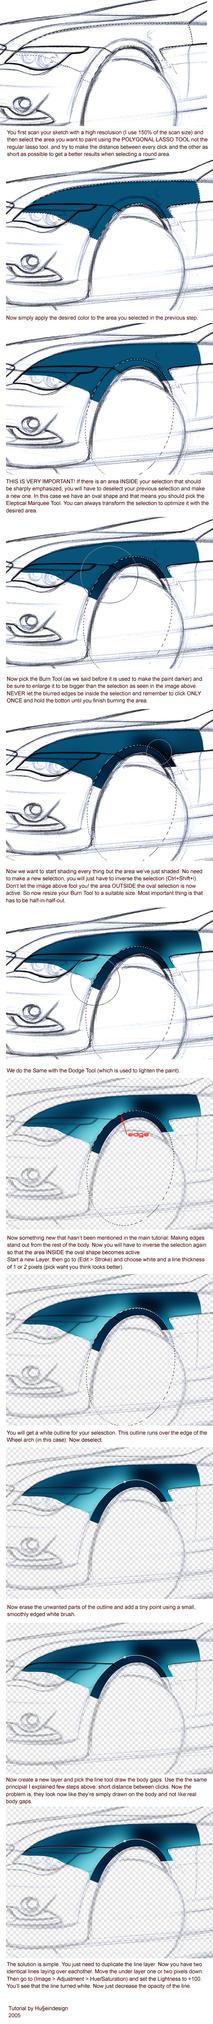 Painting a car digitally II